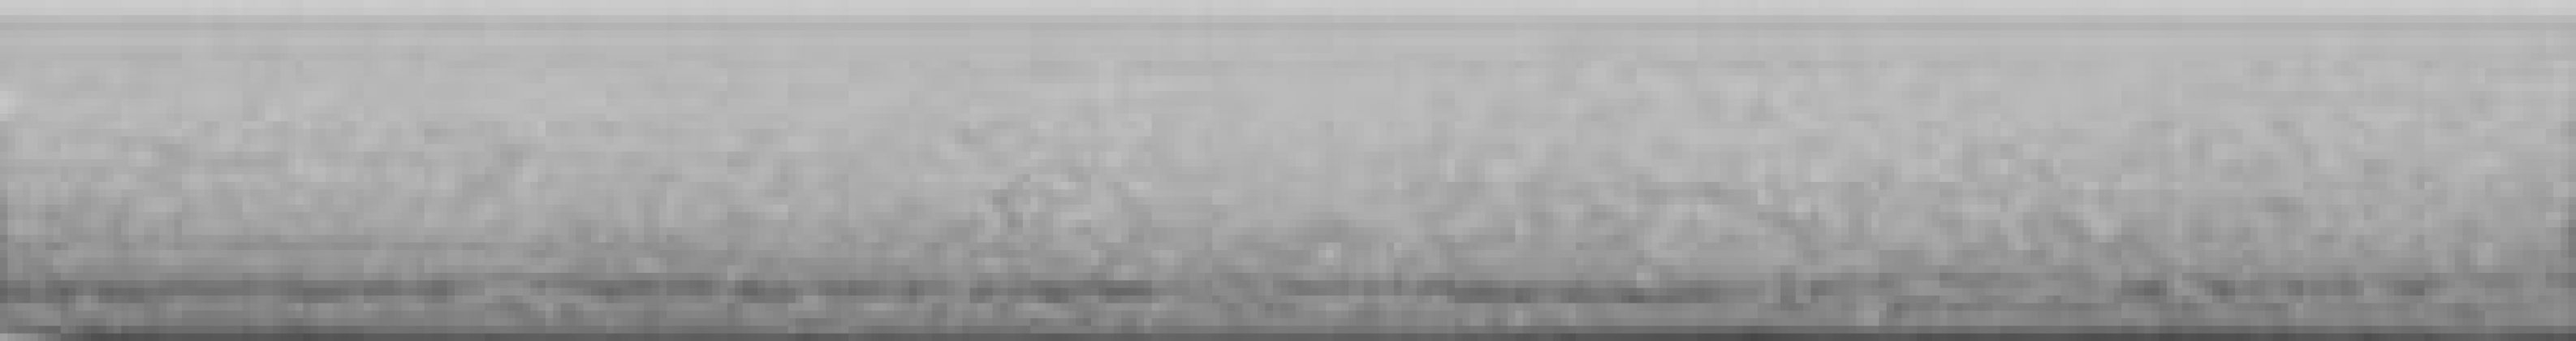 TORELO CHIC GRIS 2x15